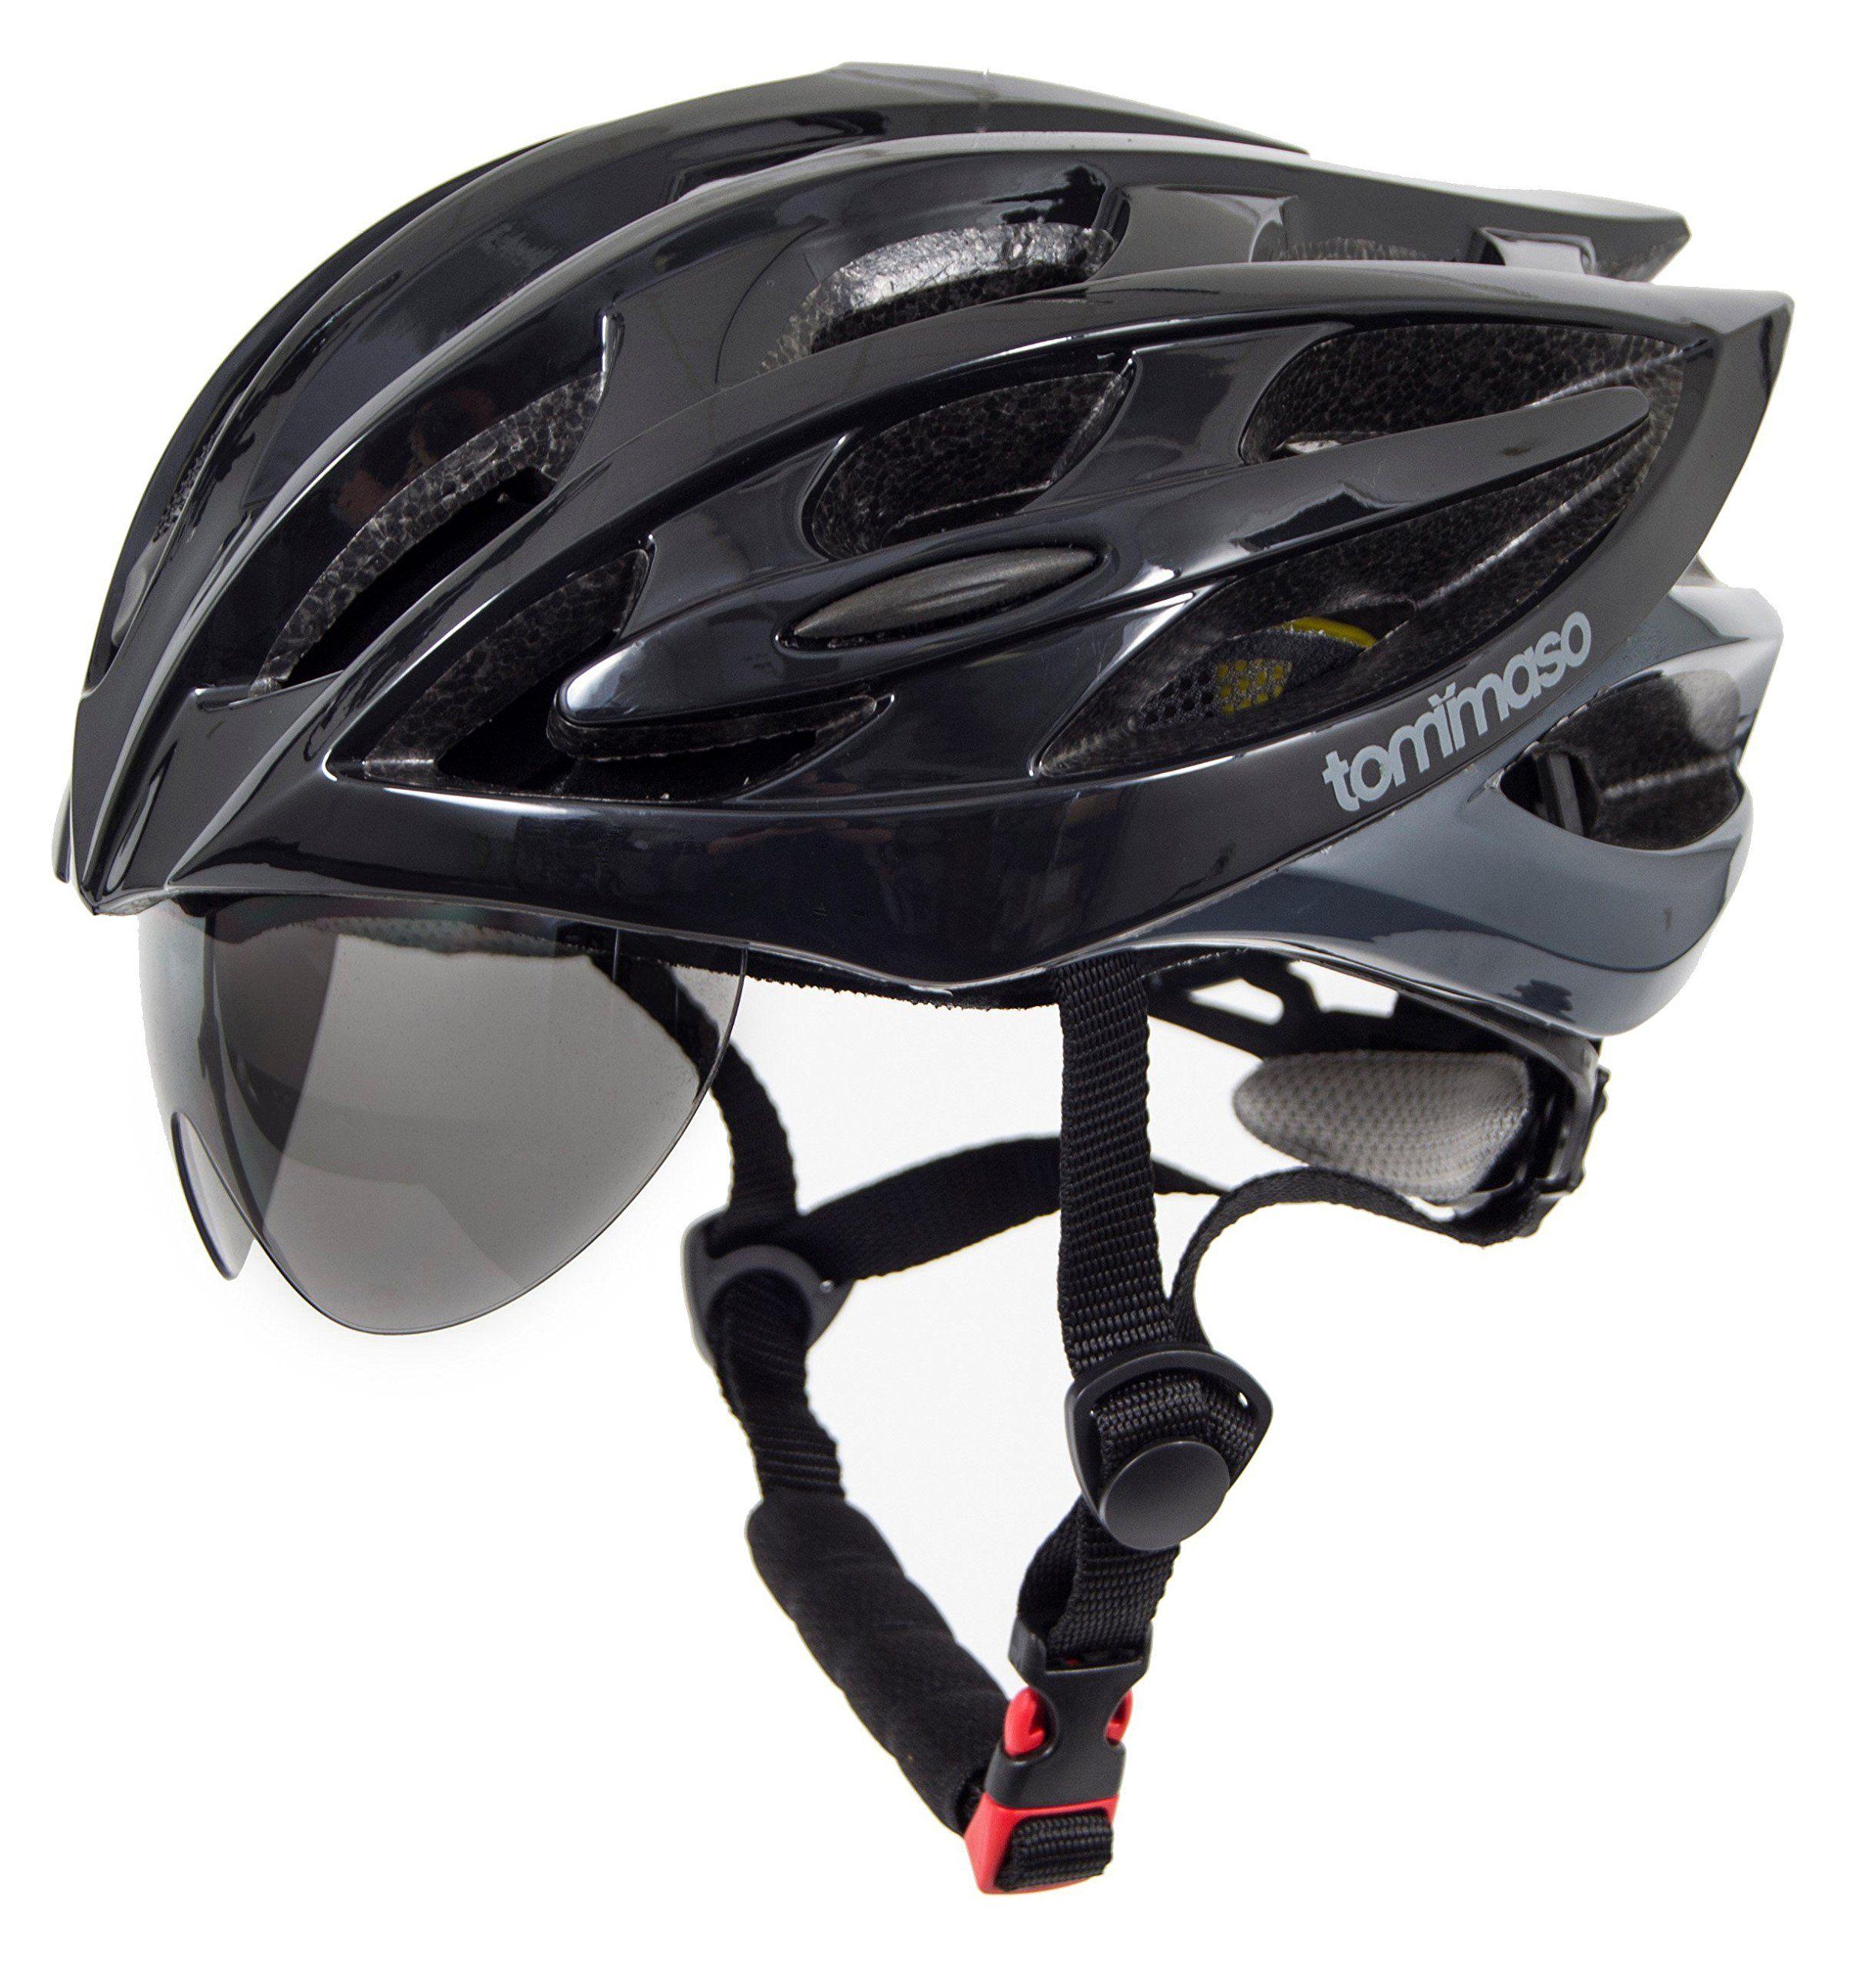 Tommaso Sole Lightweight Cycling Bike Helmet With Retractable Eye